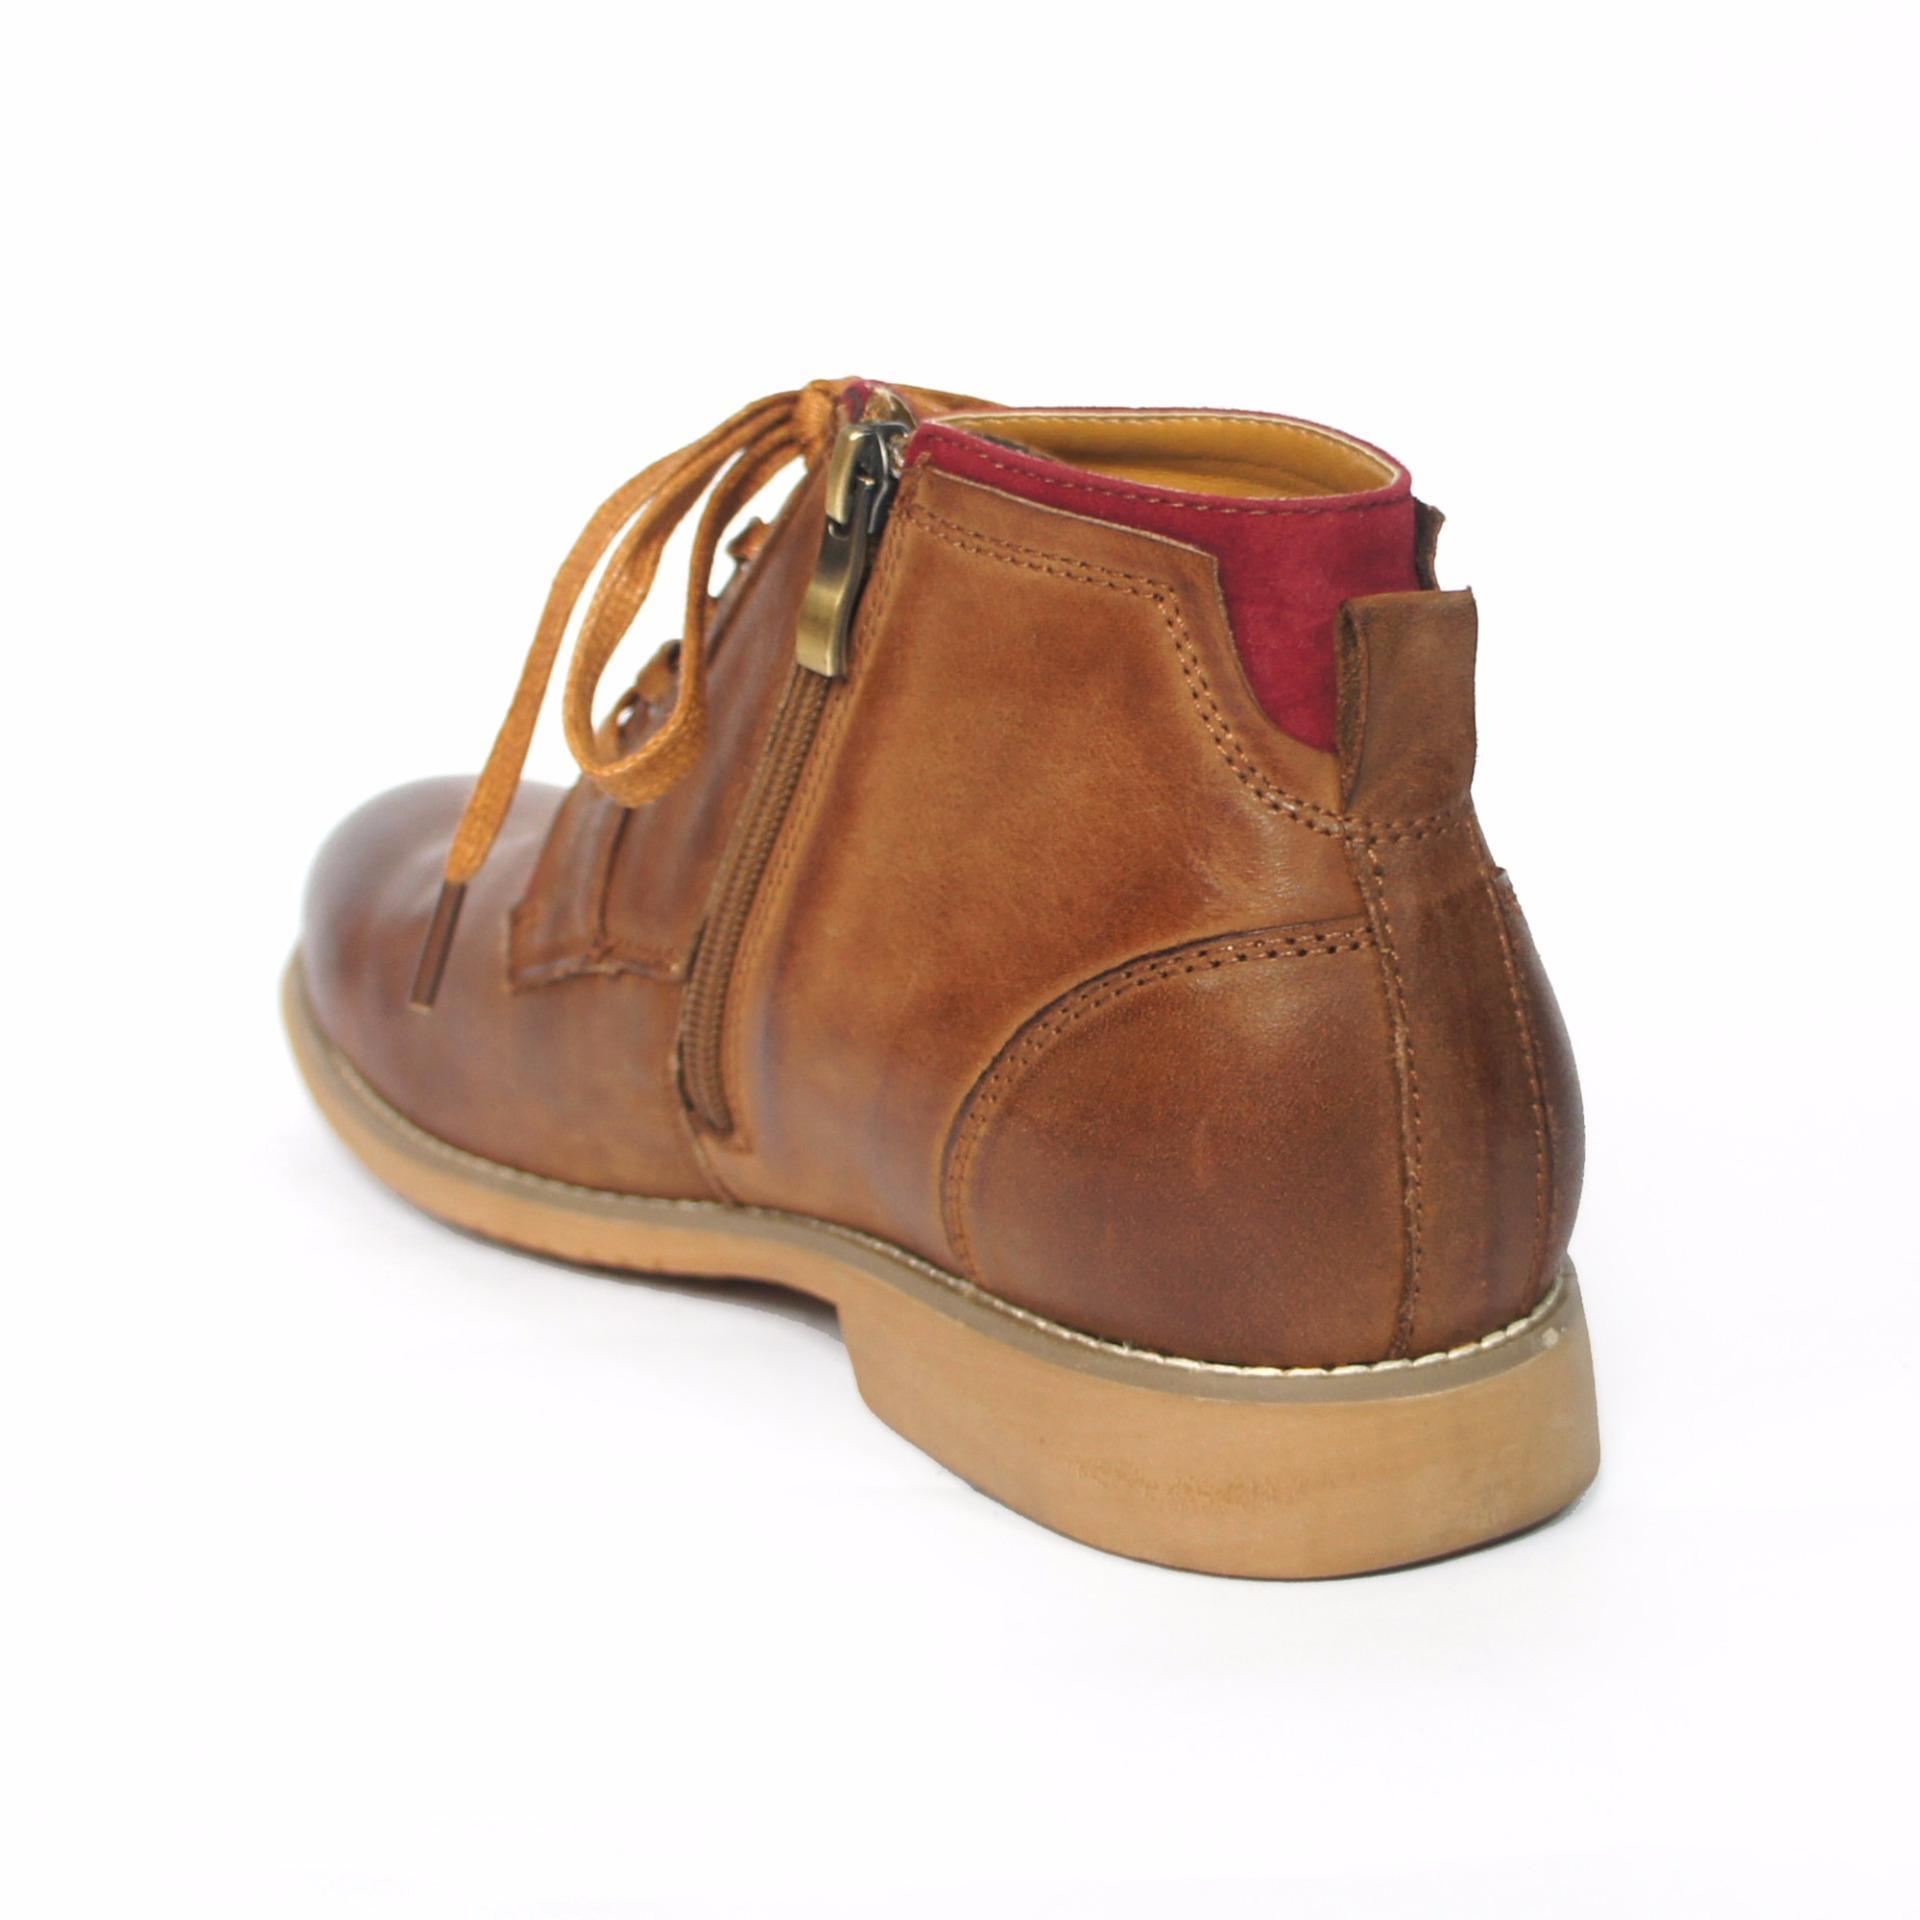 Jim Joker Heat 1cg Coffee Review Harga Terkini Dan Terlengkap Sepatu Casual Haper 72